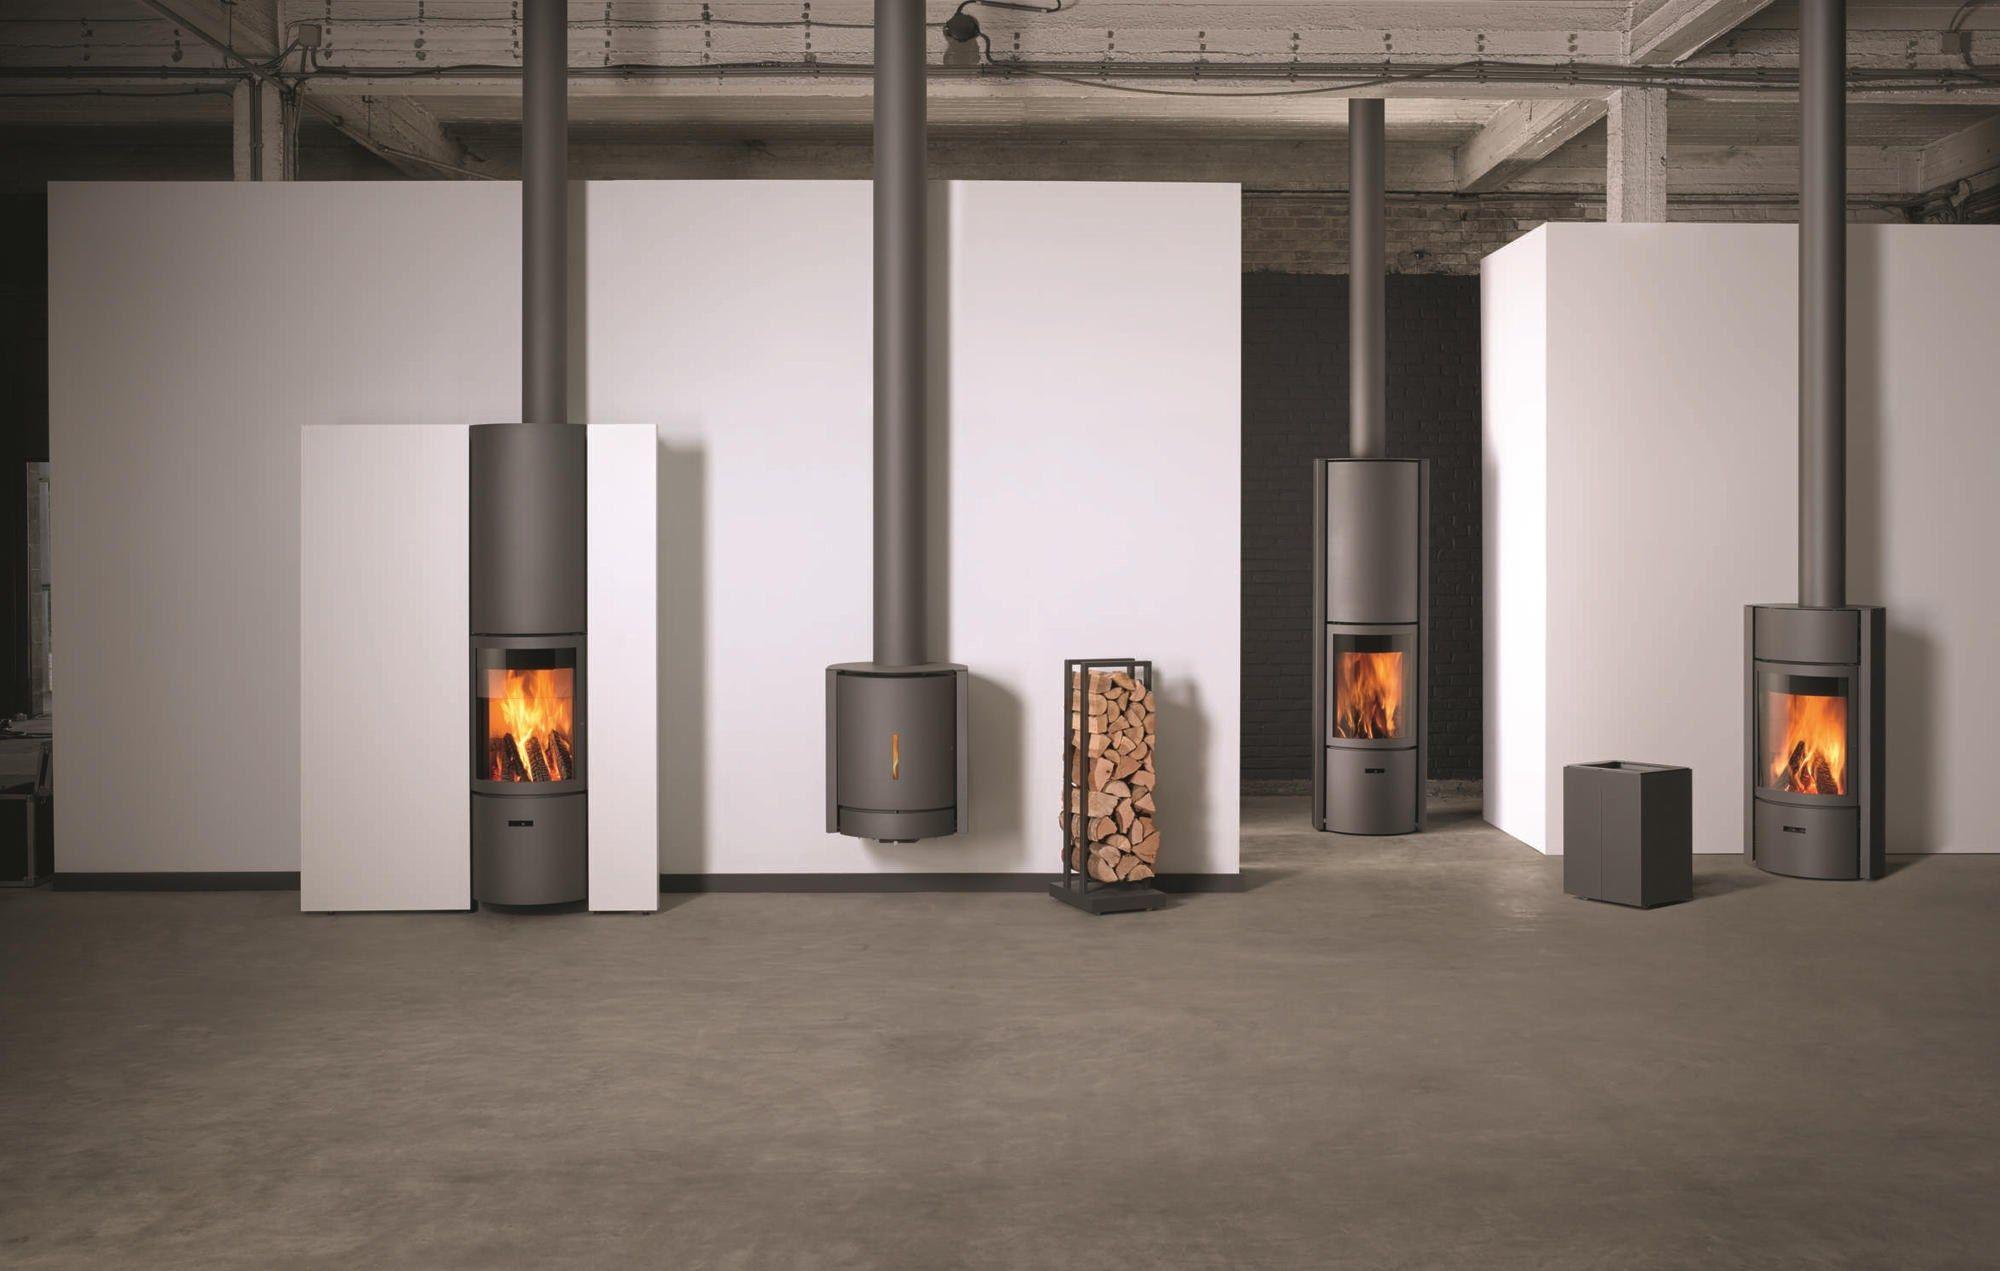 stufa a legna rotante in acciaio inox st v 30 up collezione st v 30 by st v. Black Bedroom Furniture Sets. Home Design Ideas